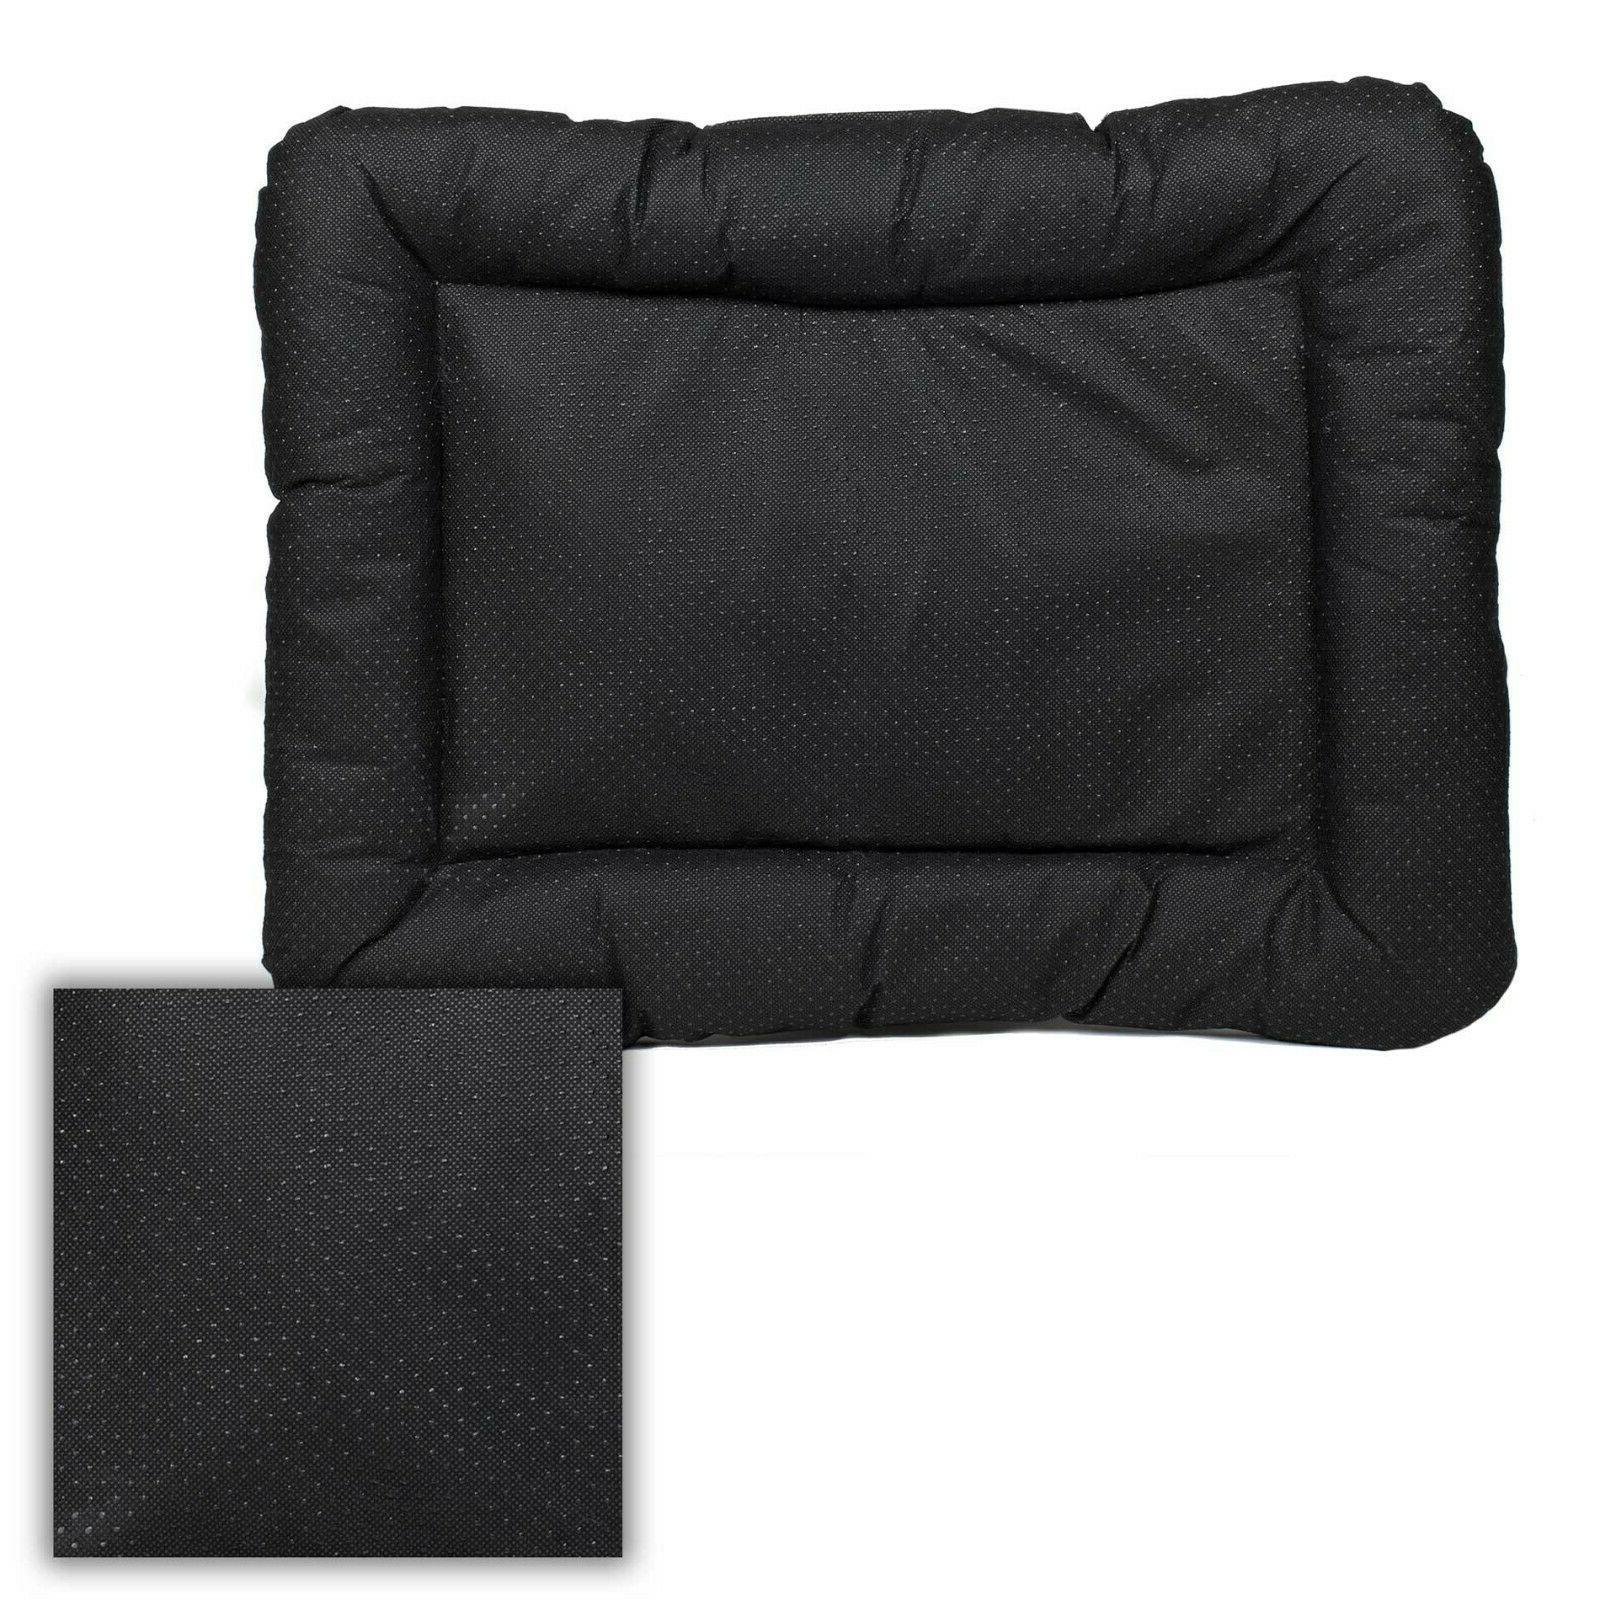 Dog Pad Bed Small, Large, Grey